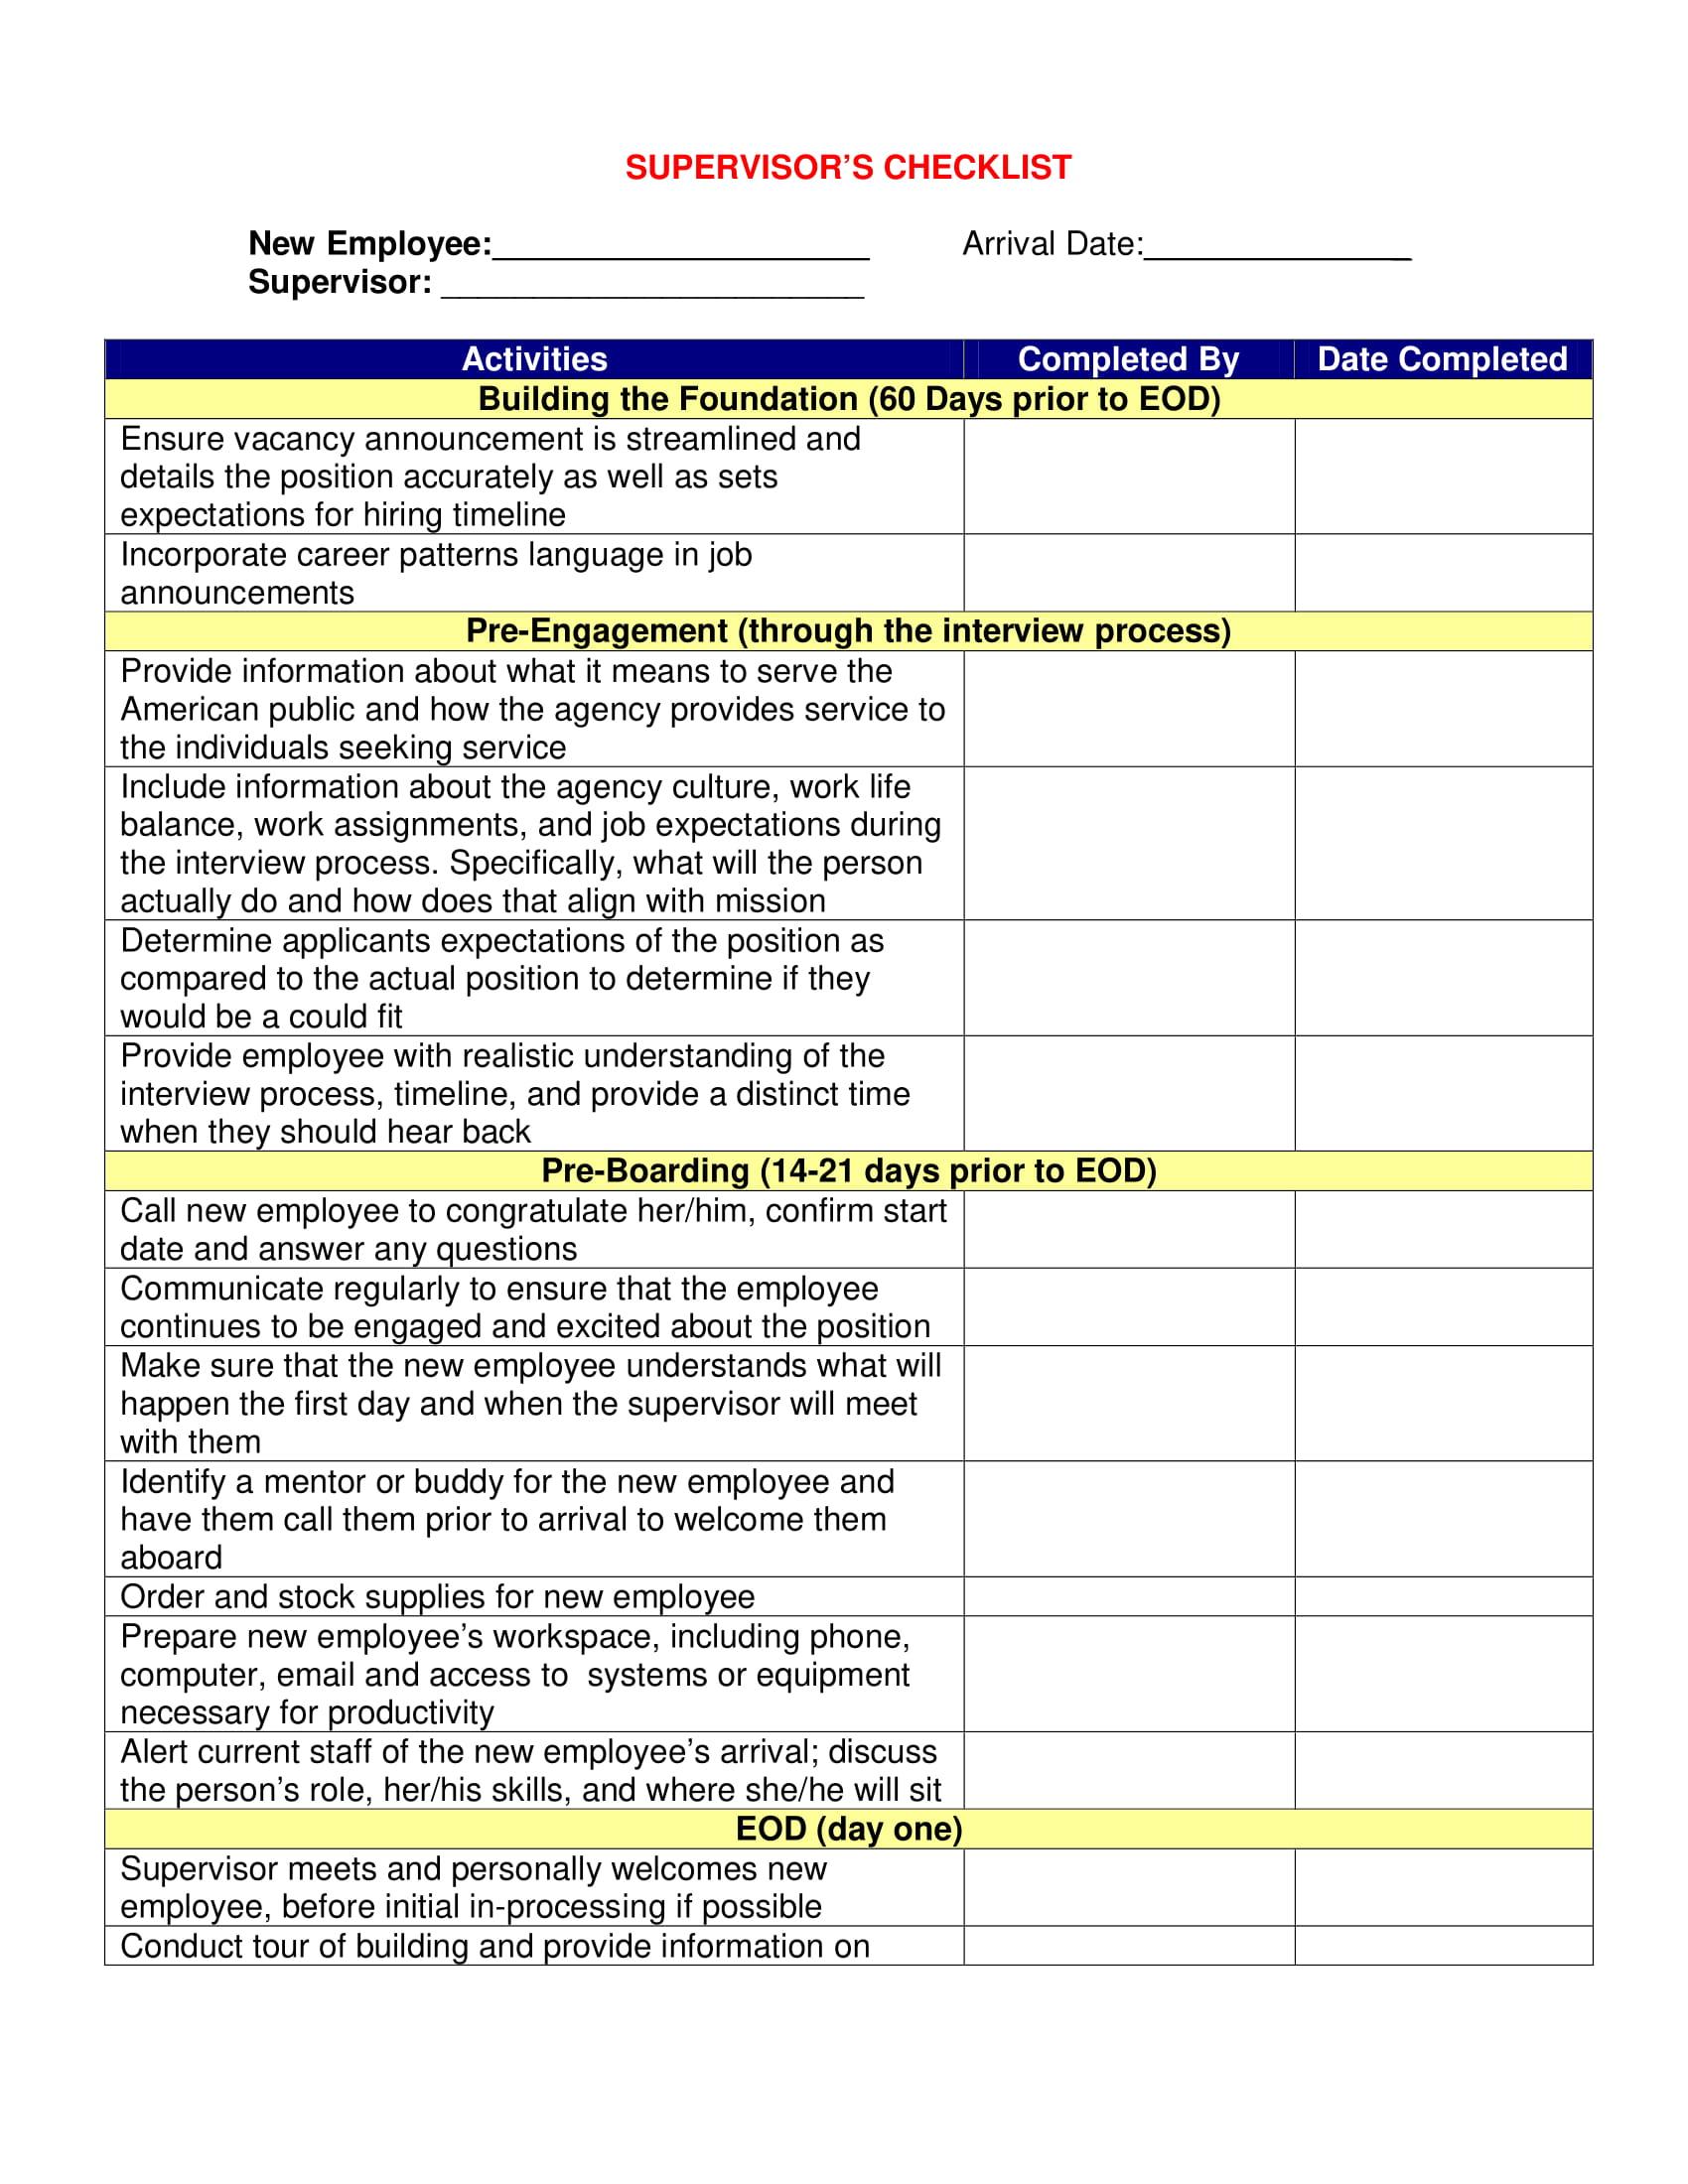 basic supervisors checklist example